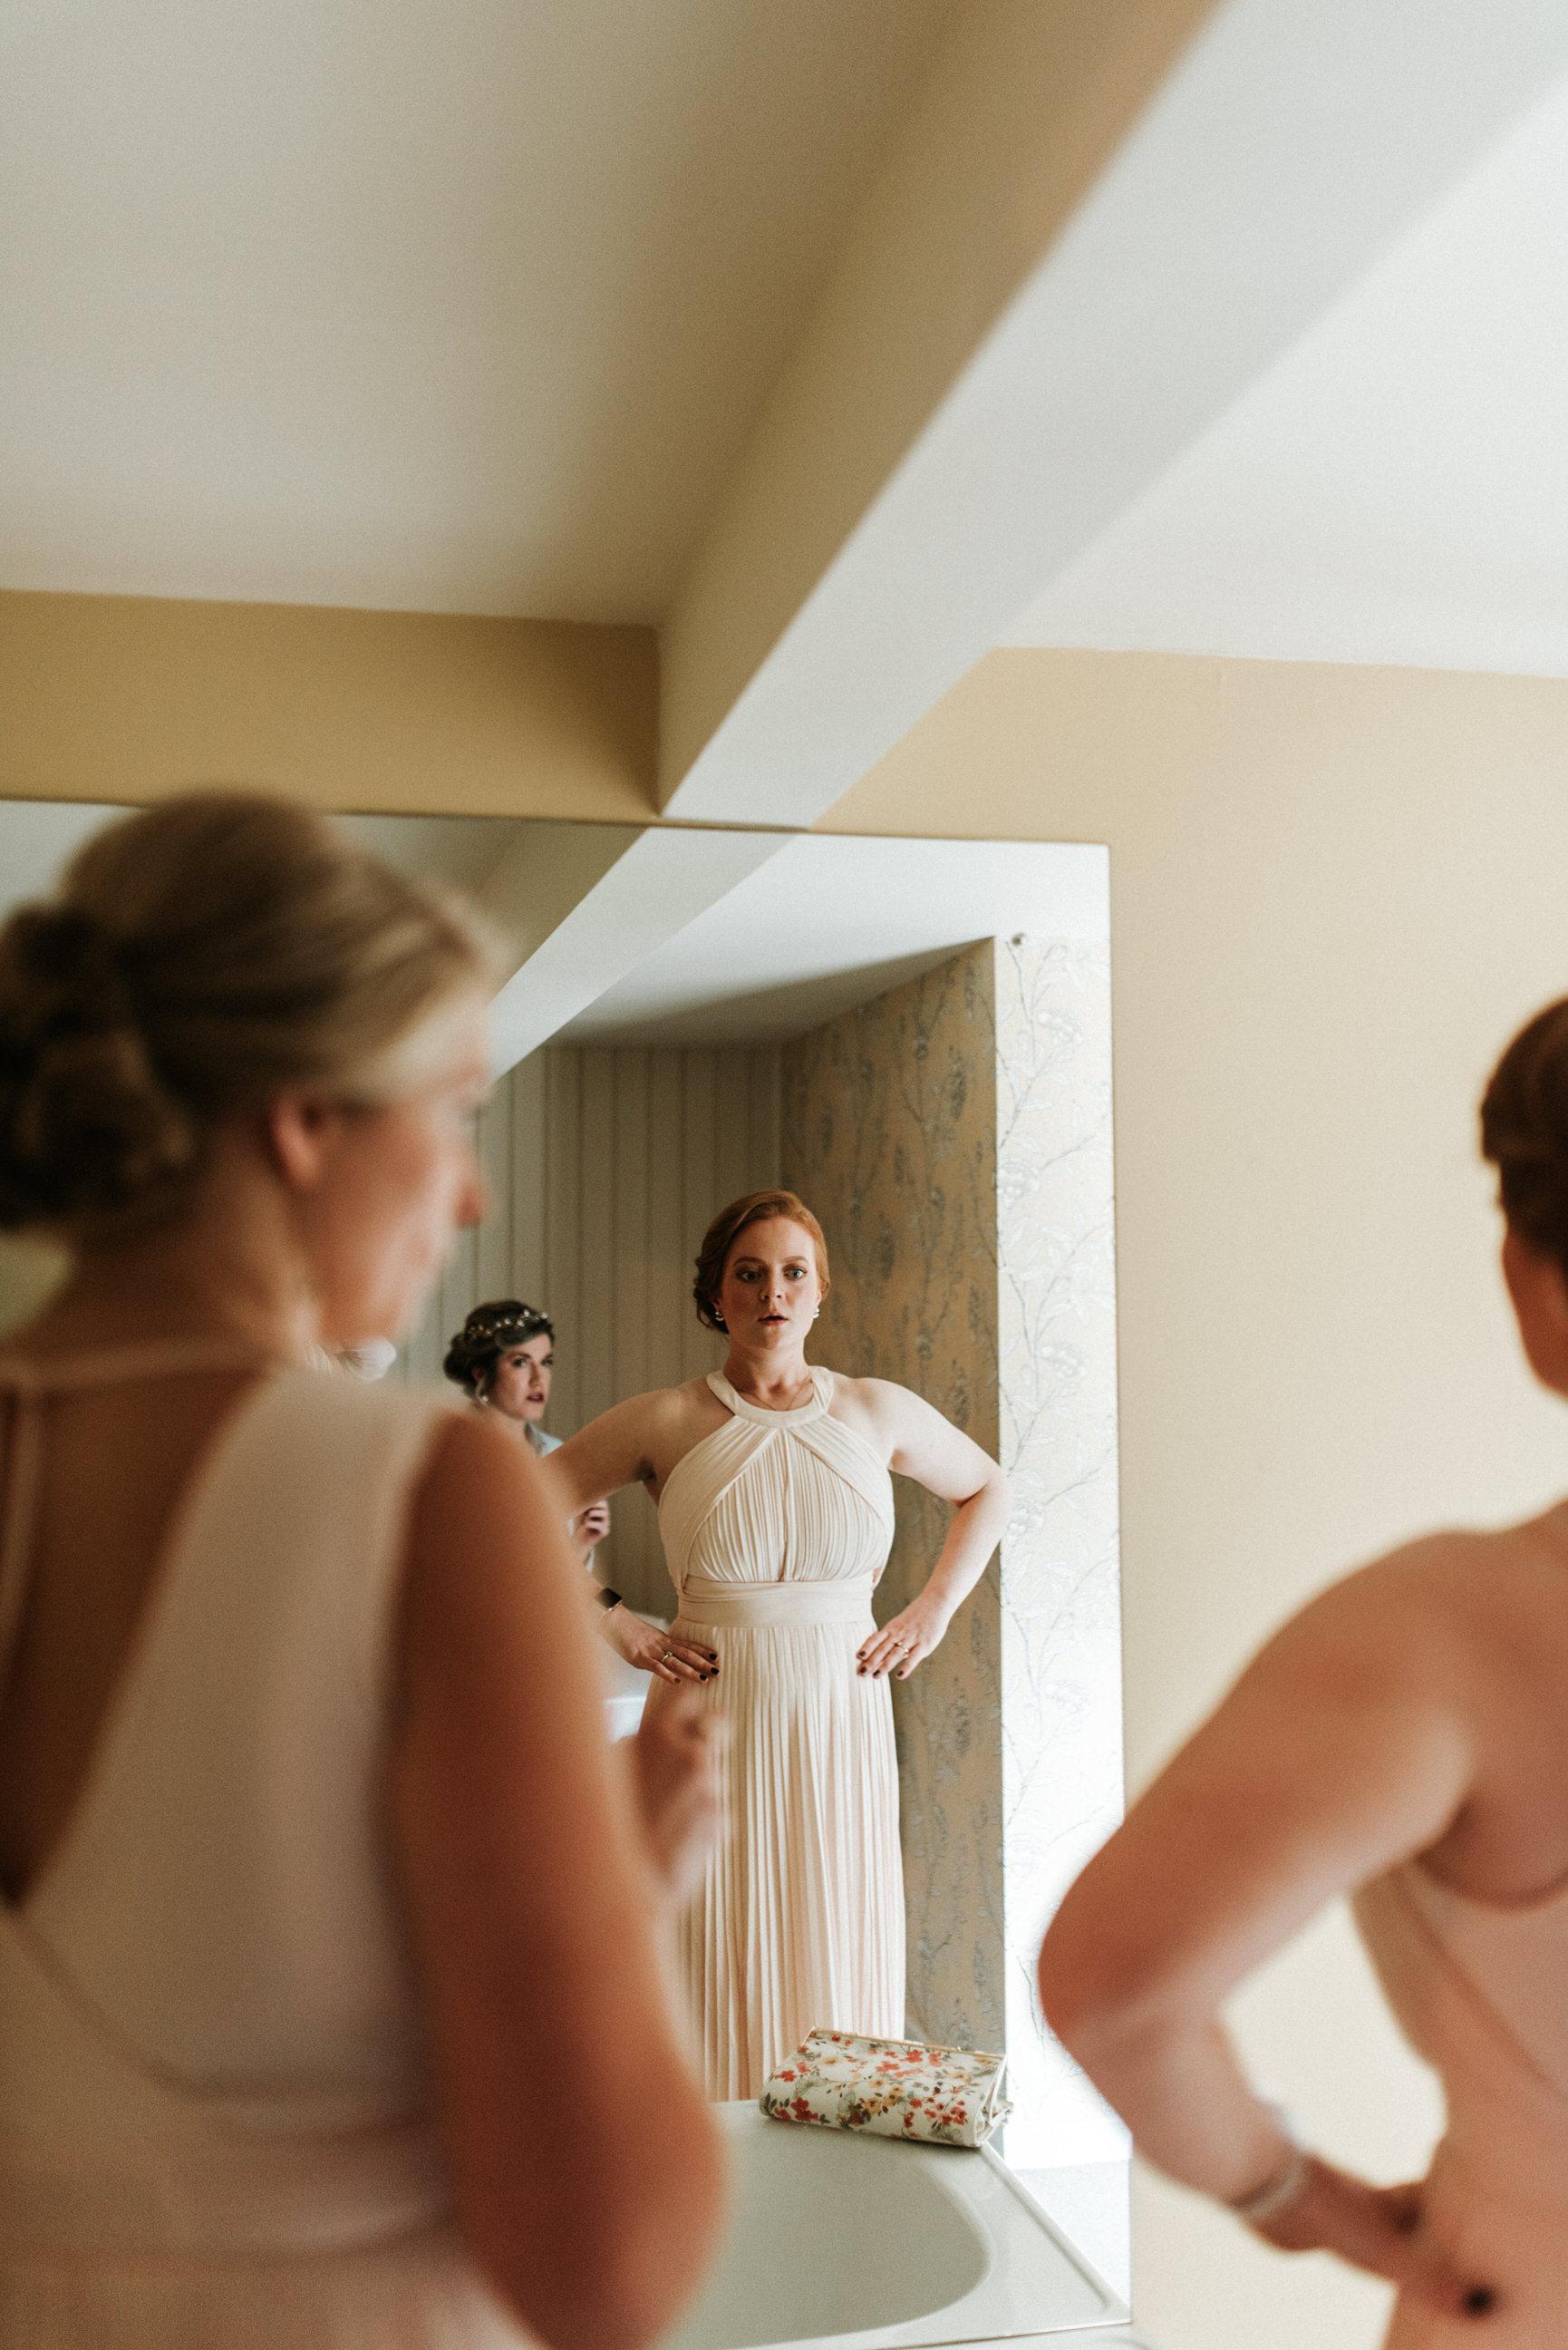 lissanoure castle wedding, northern ireland wedding photographer, romantic northern irish wedding venue, castle wedding ireland, natural wedding photography ni (29).jpg